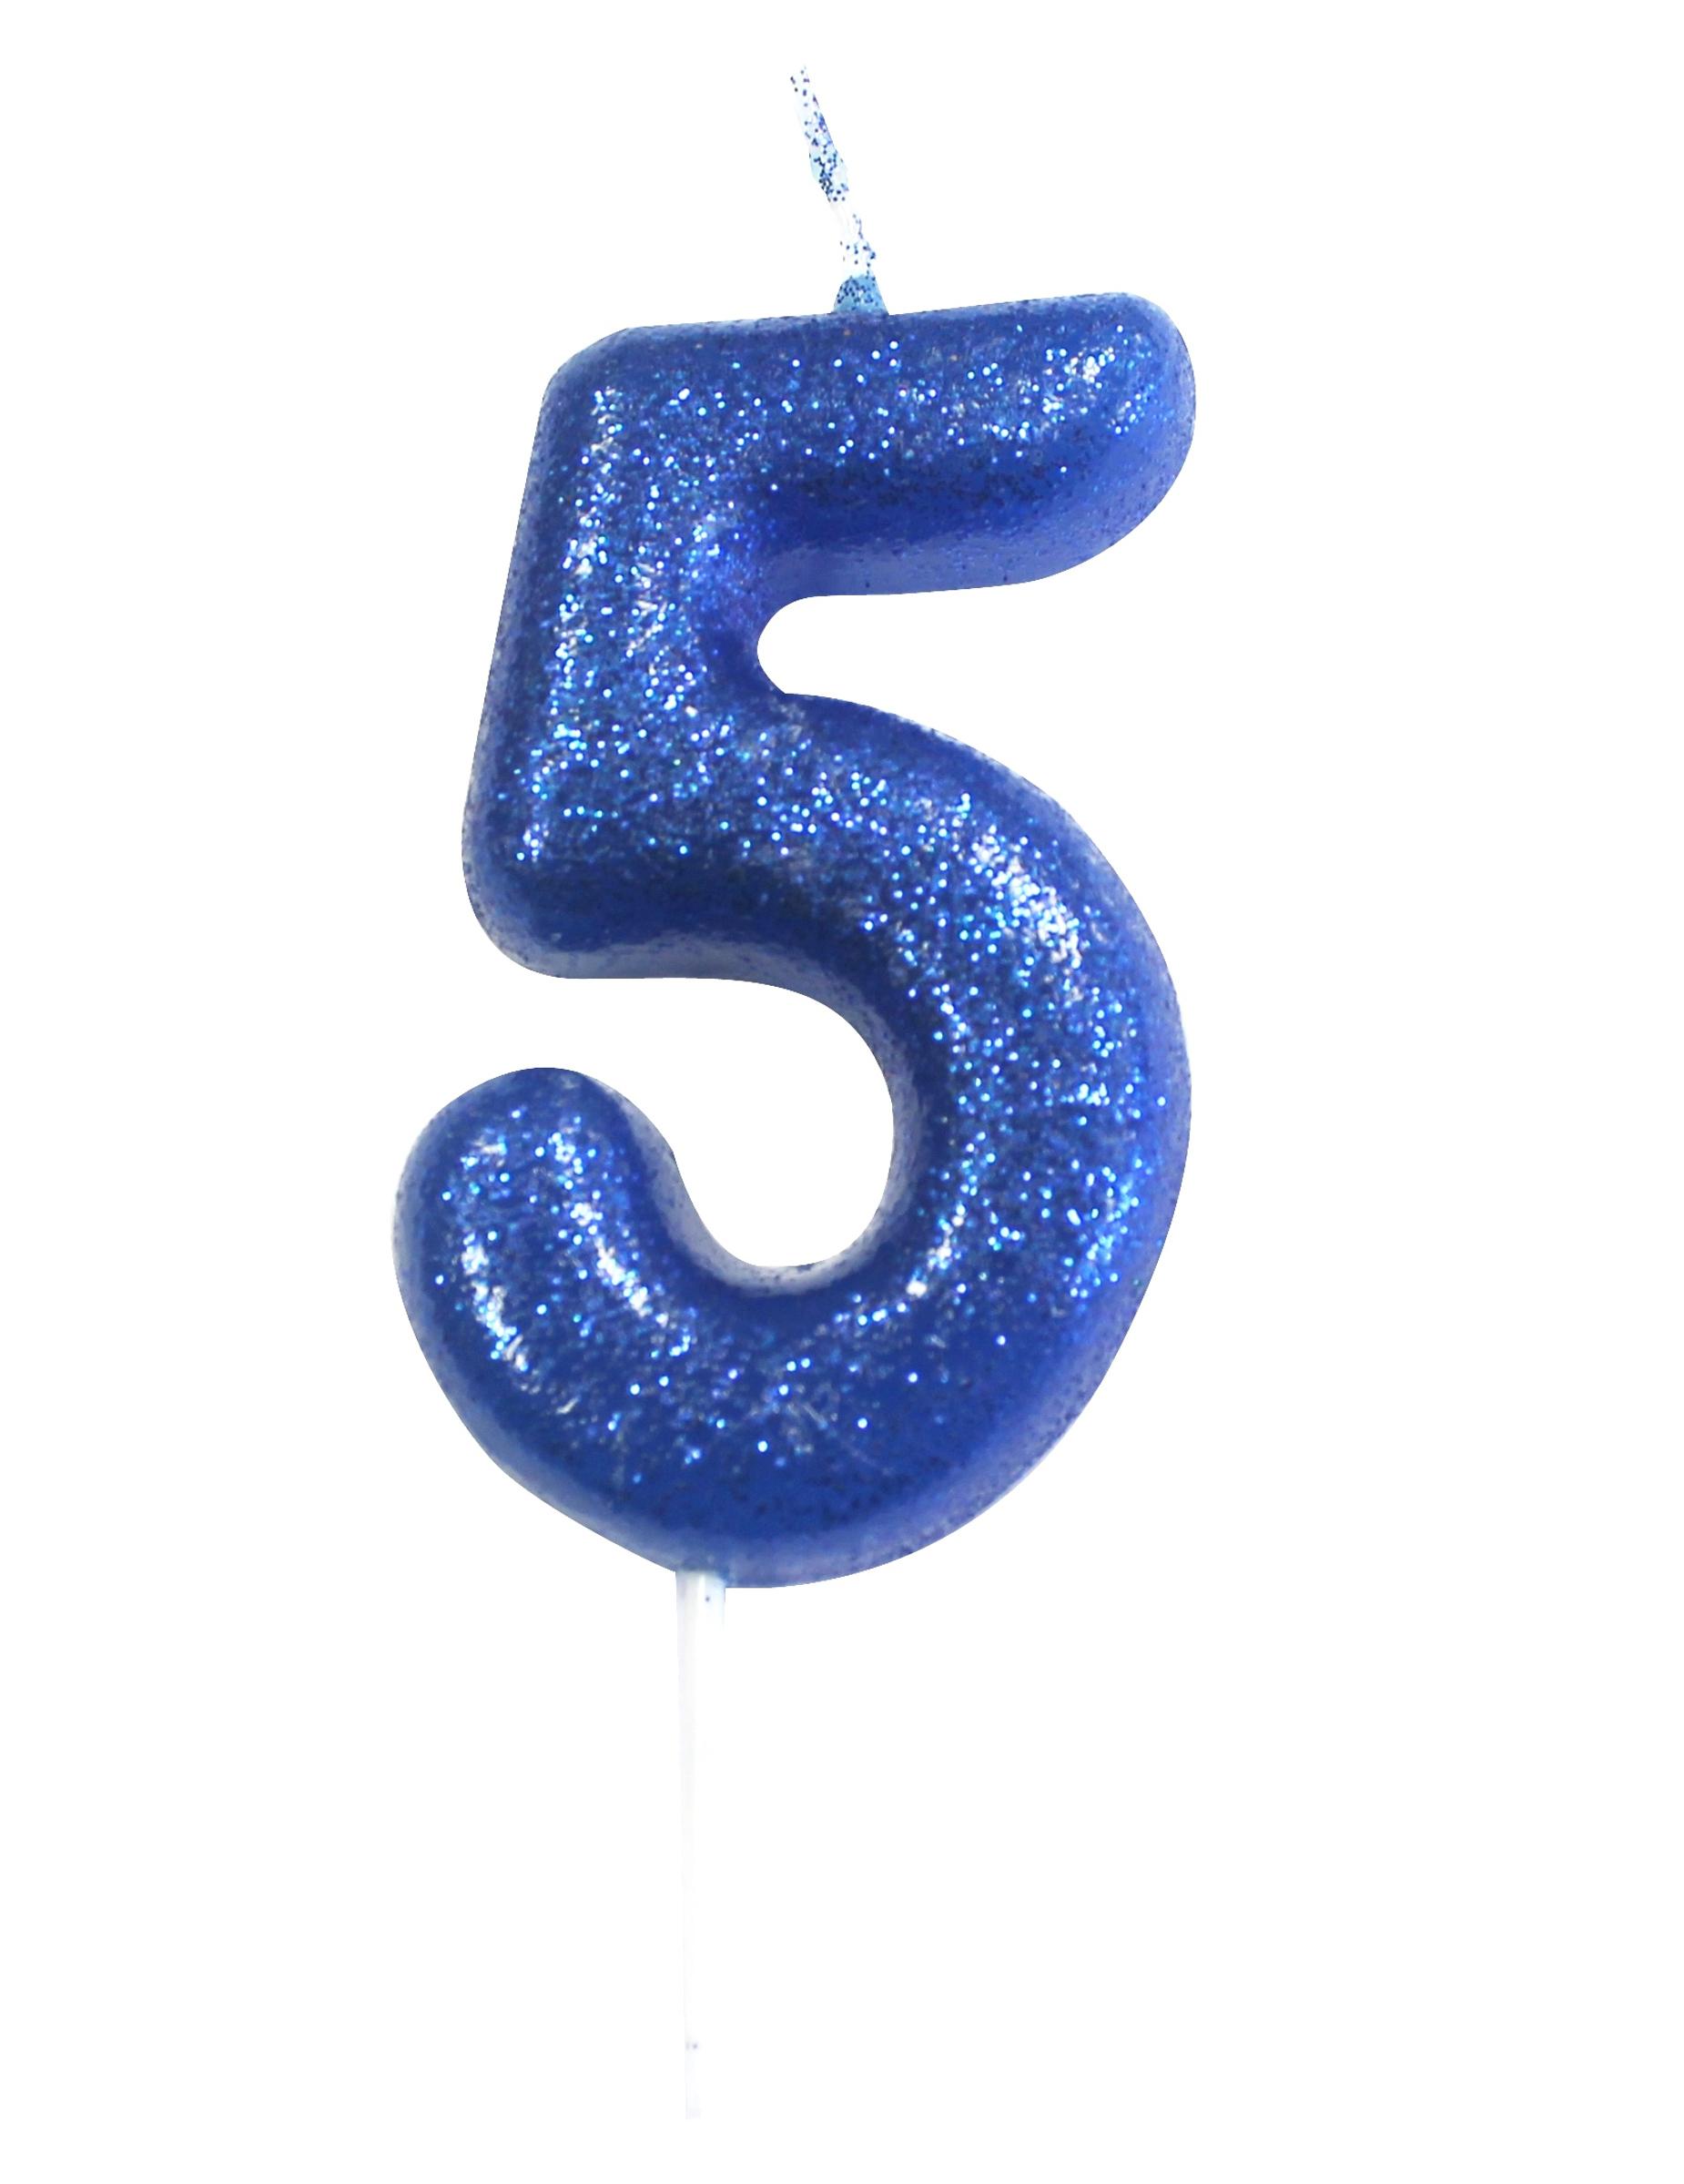 5 Chiffres Bougies Gâteau Bougies anniversaire bougies bougies numéro